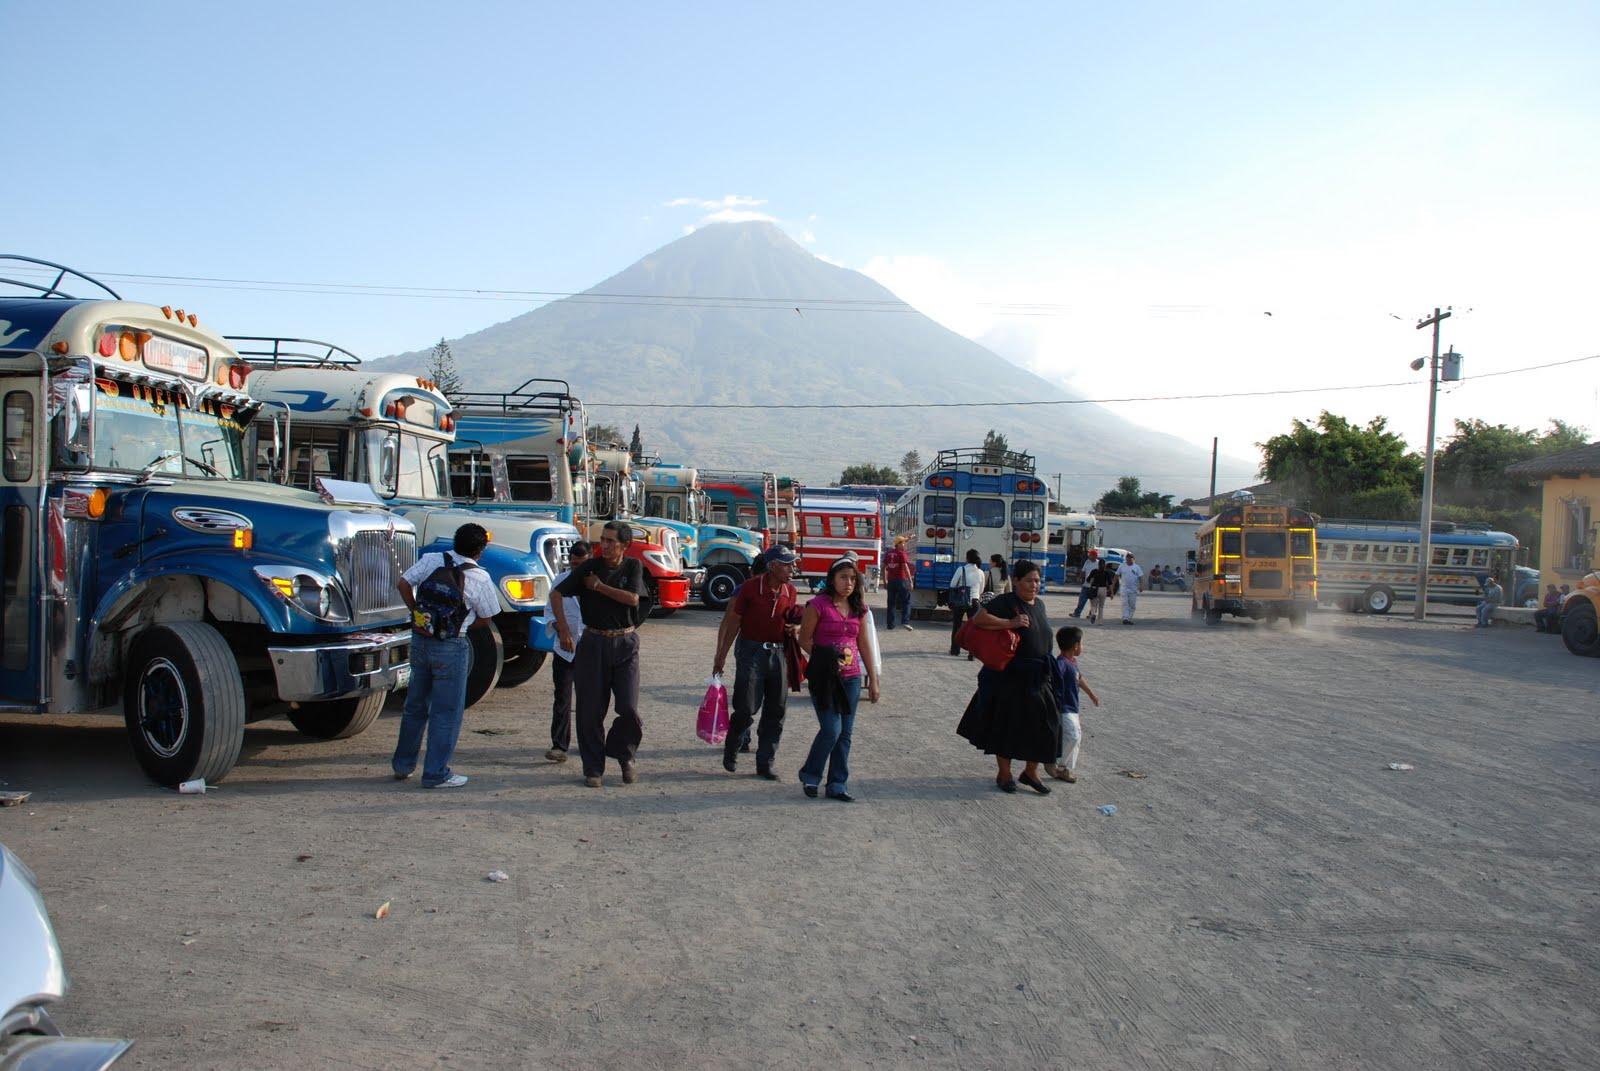 GUATEMALAN BUS DEPOT